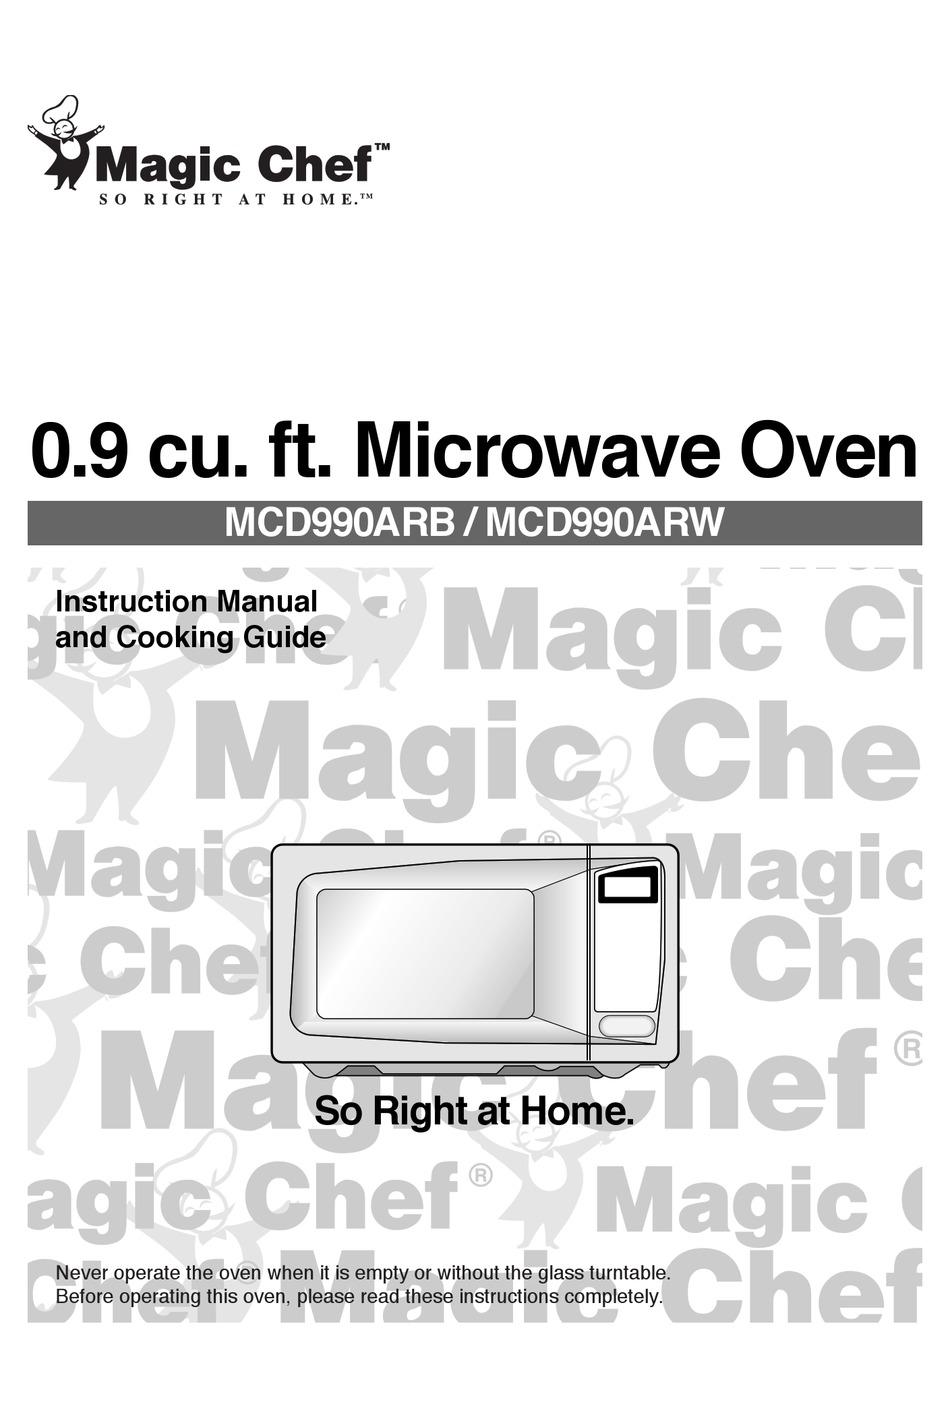 magic chef mcd990arb instruction manual